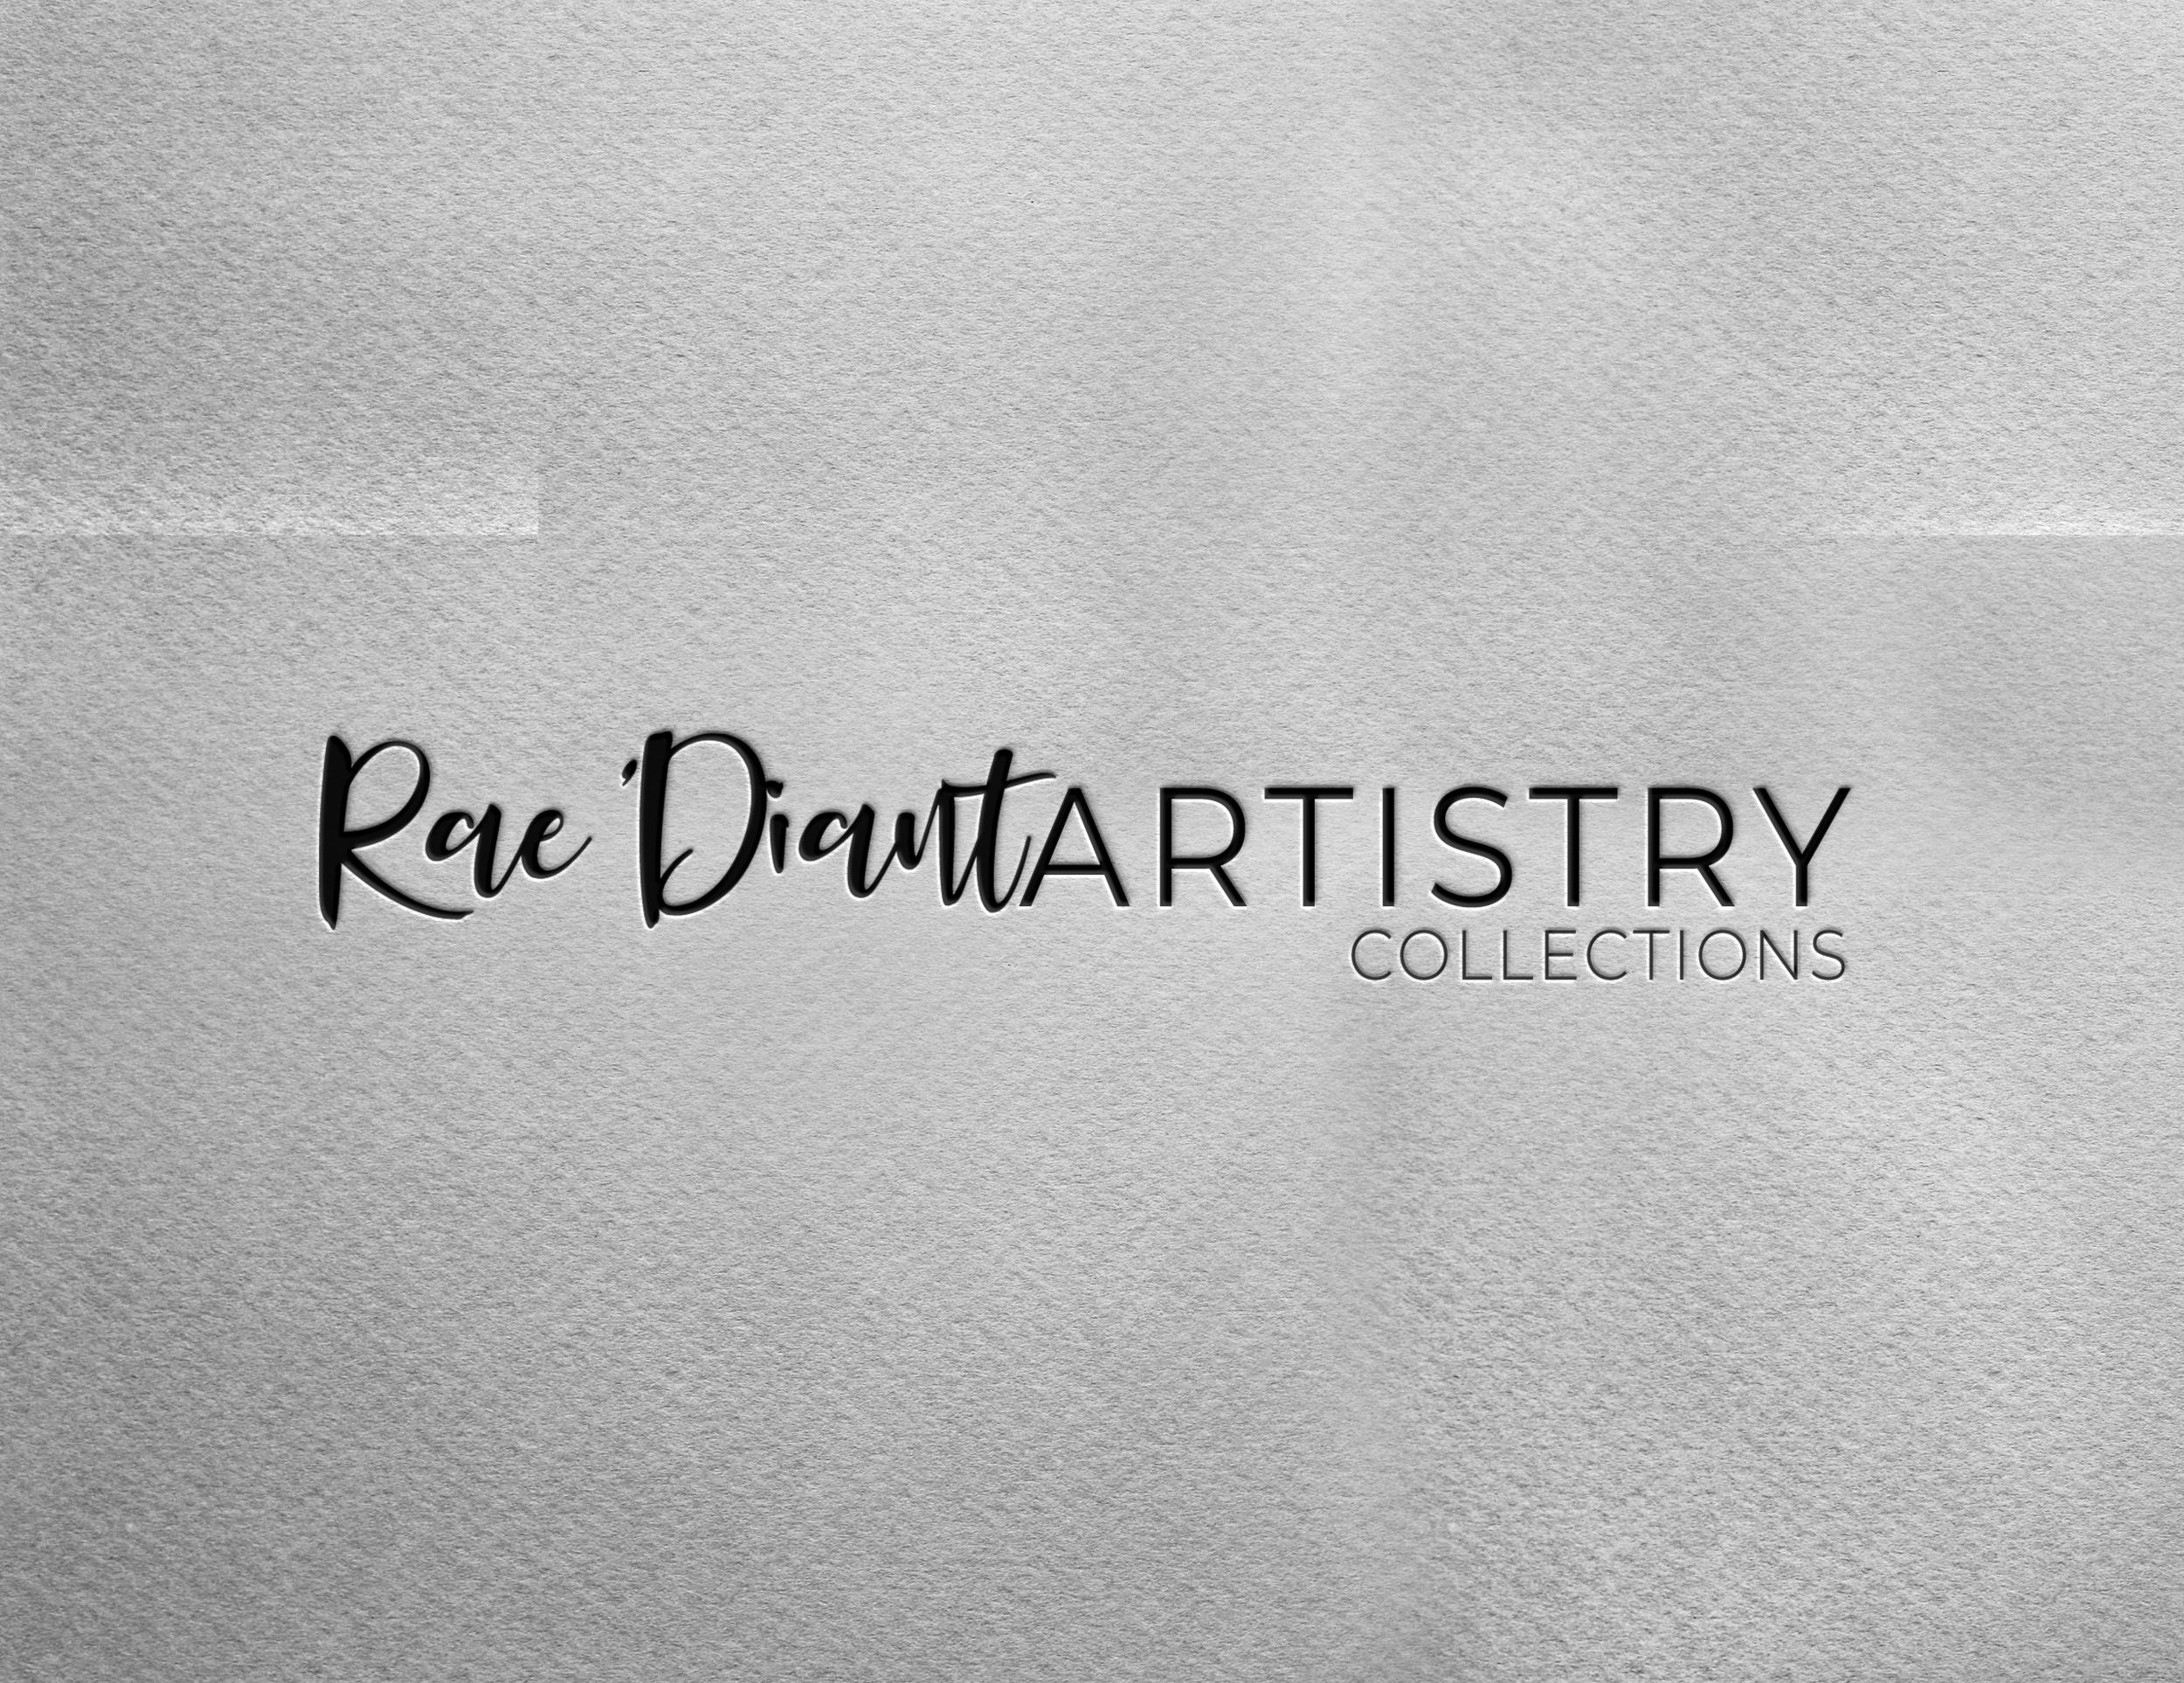 Rae'Diant Artistry Logo Mockup.png